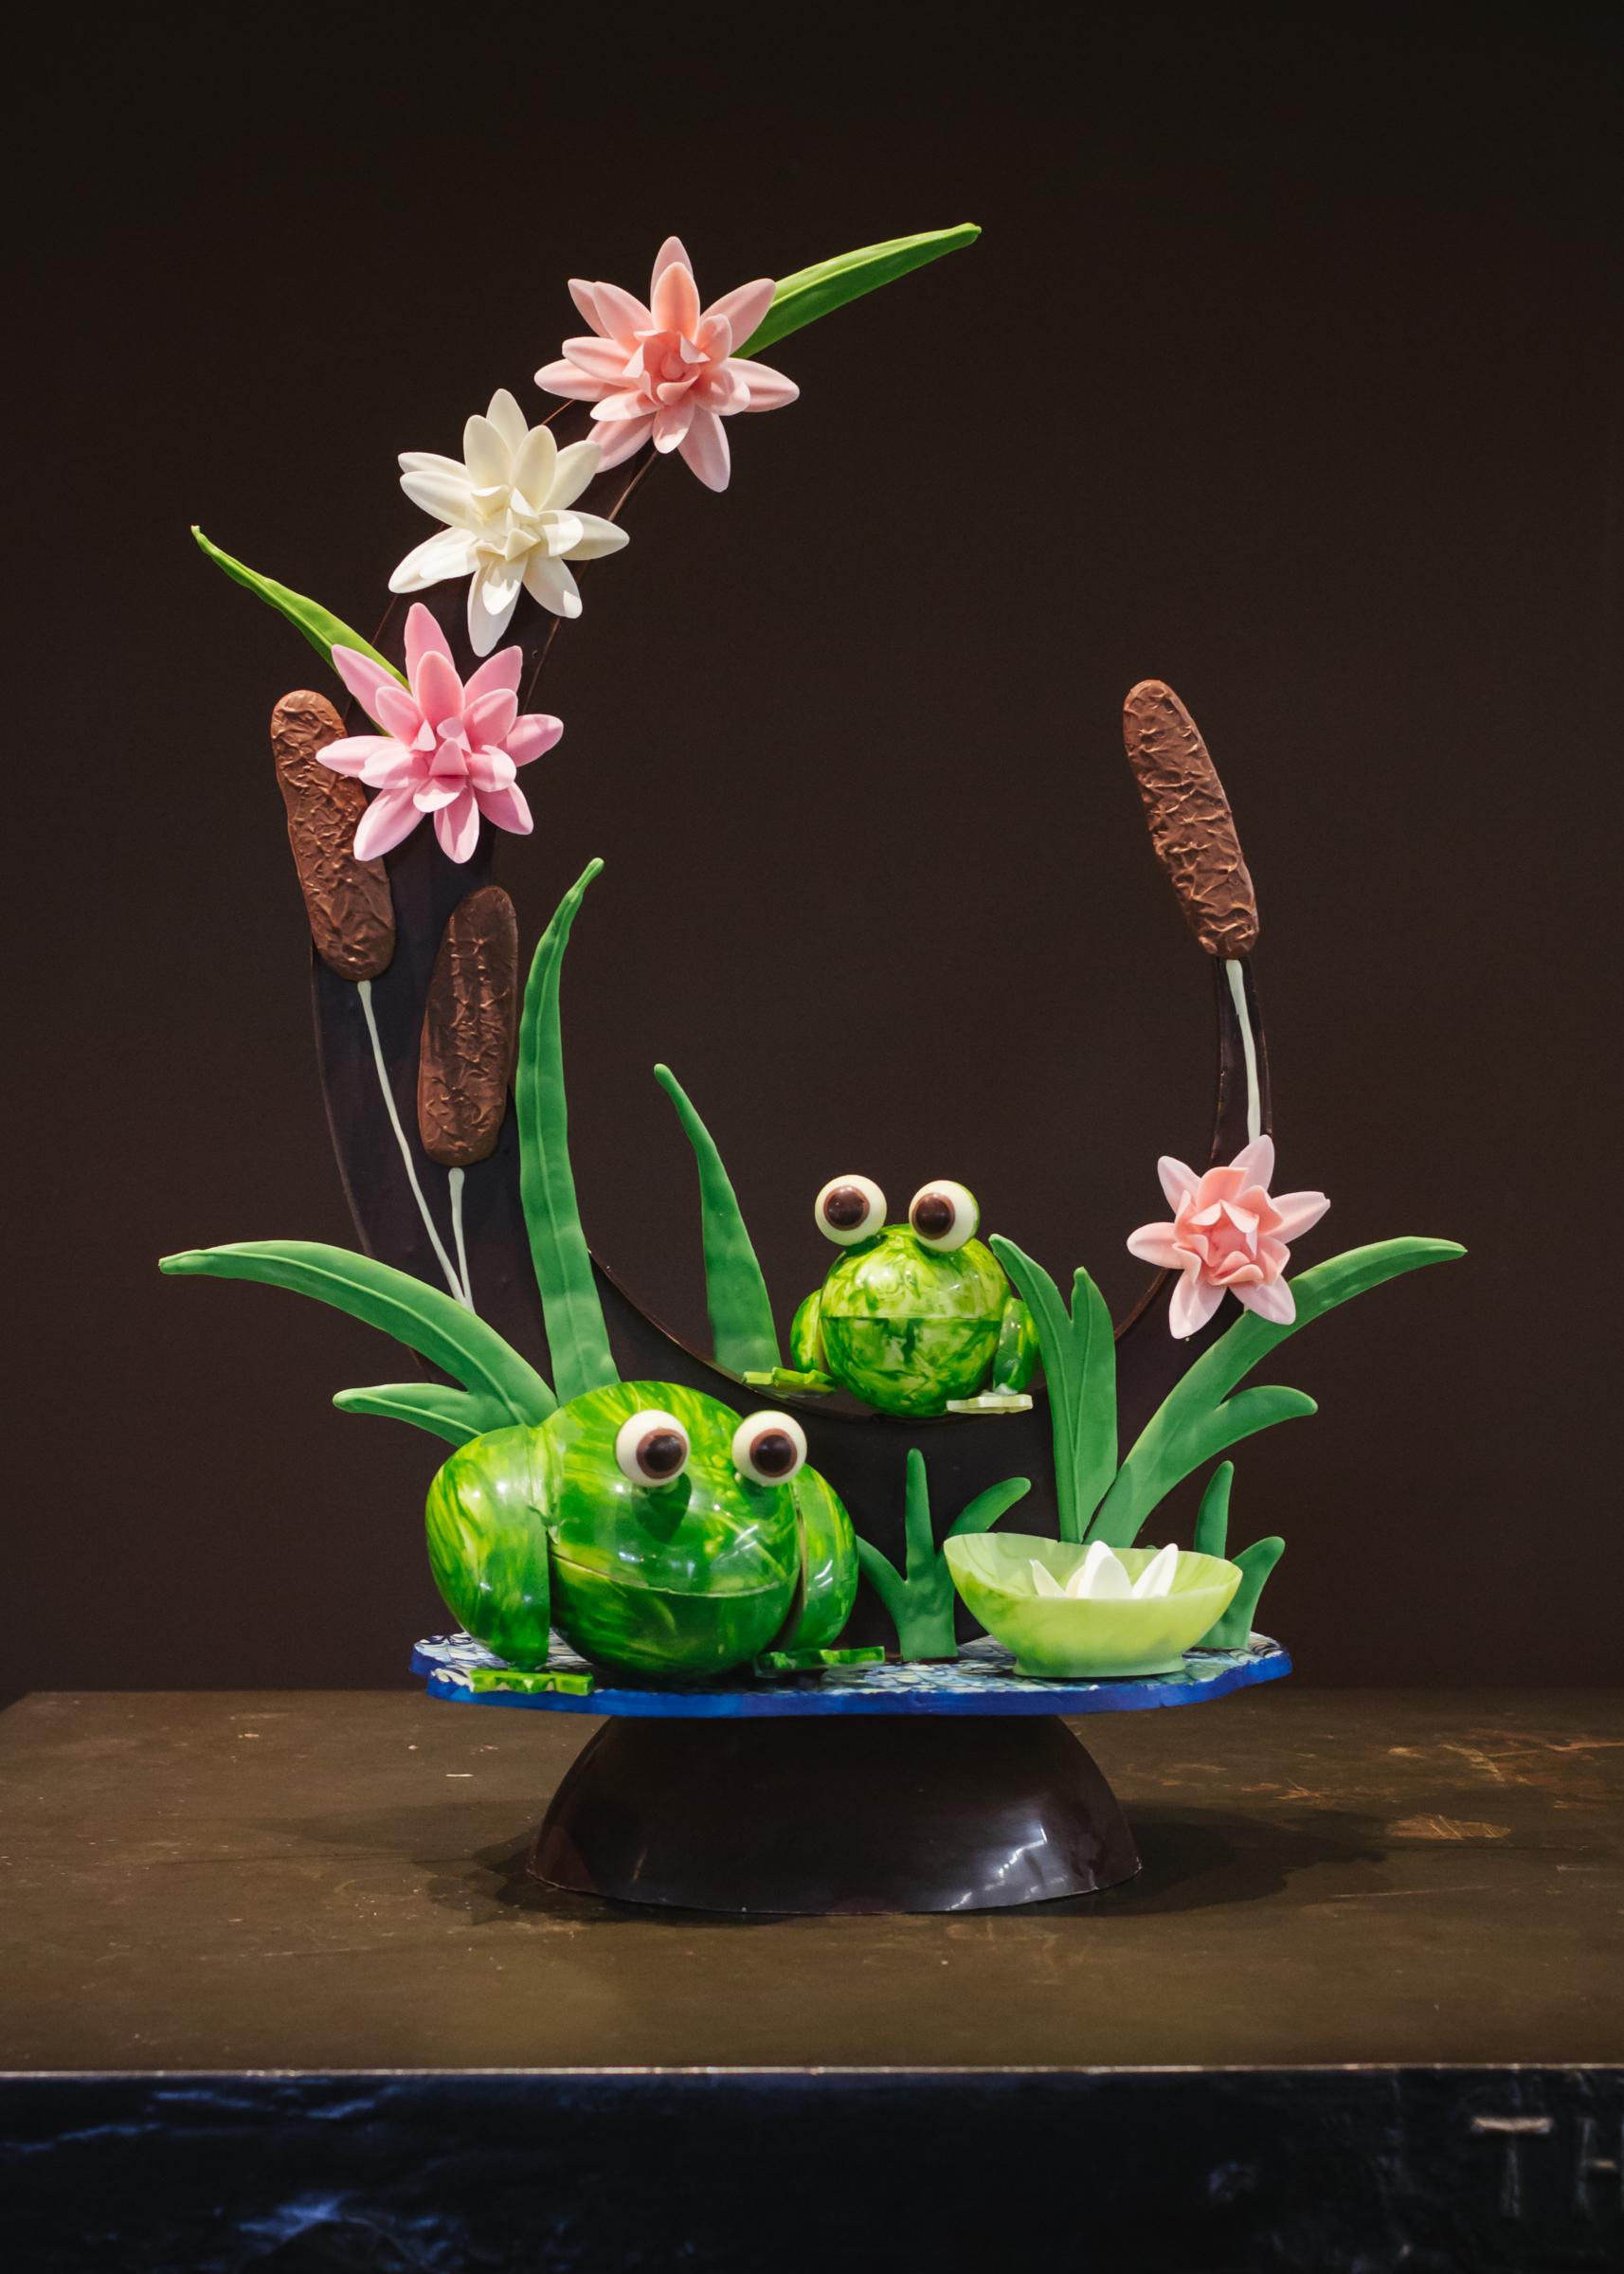 2018 Spring Chocolate Sculpture